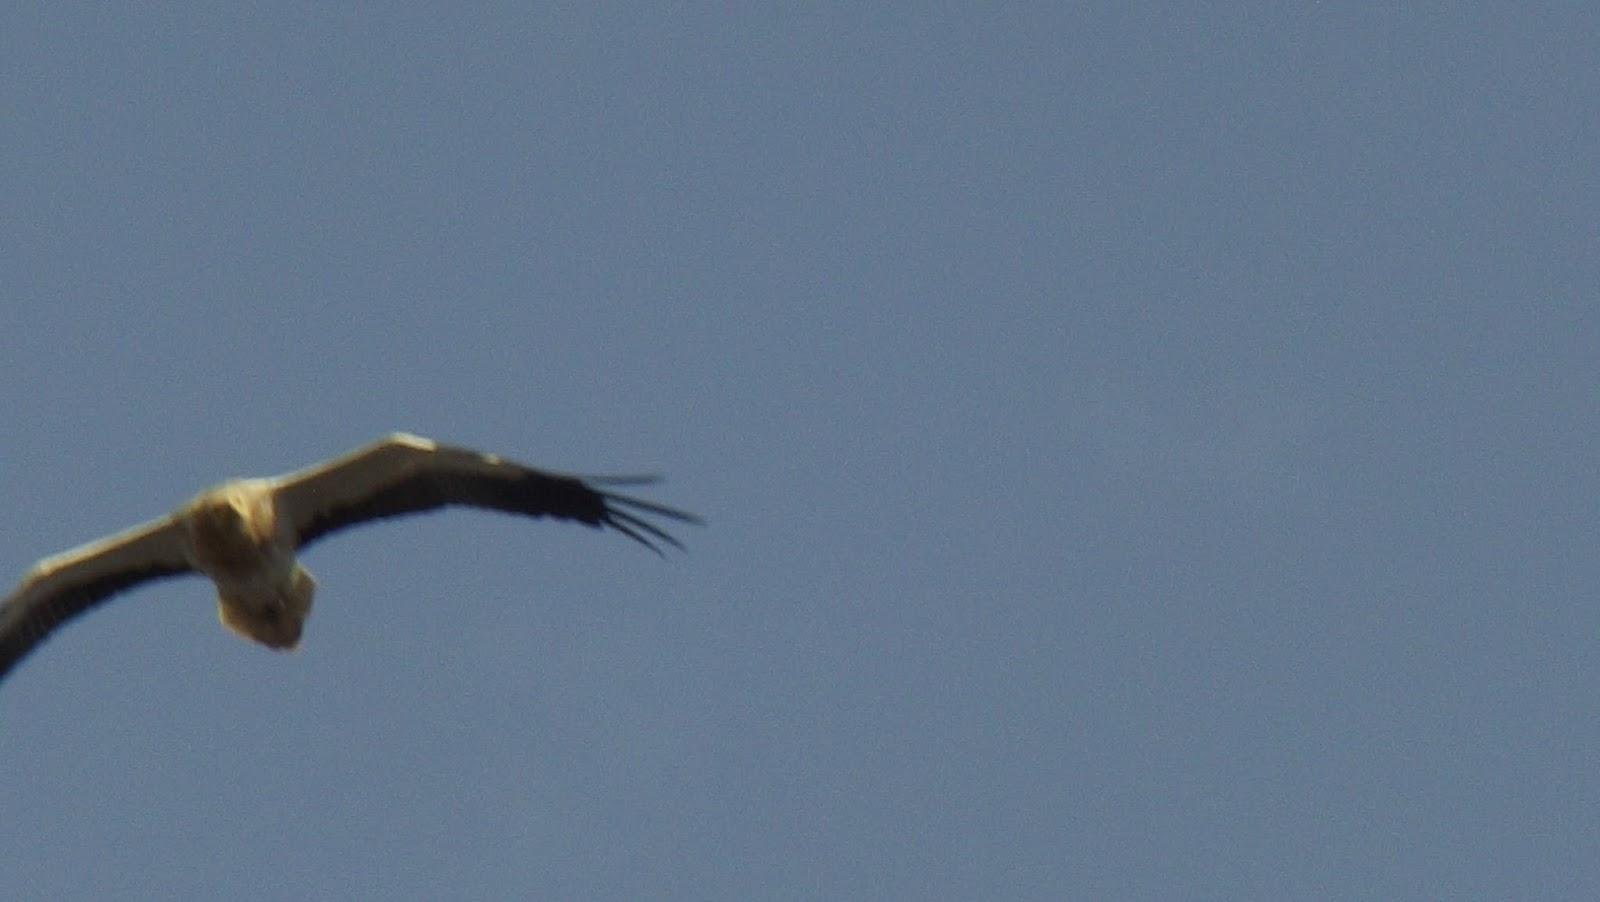 Extremadura Alimoche MigratoriasEl NaturalmenteLas MigratoriasEl Aves Alimoche NaturalmenteLas Extremadura Extremadura Aves stQhrd